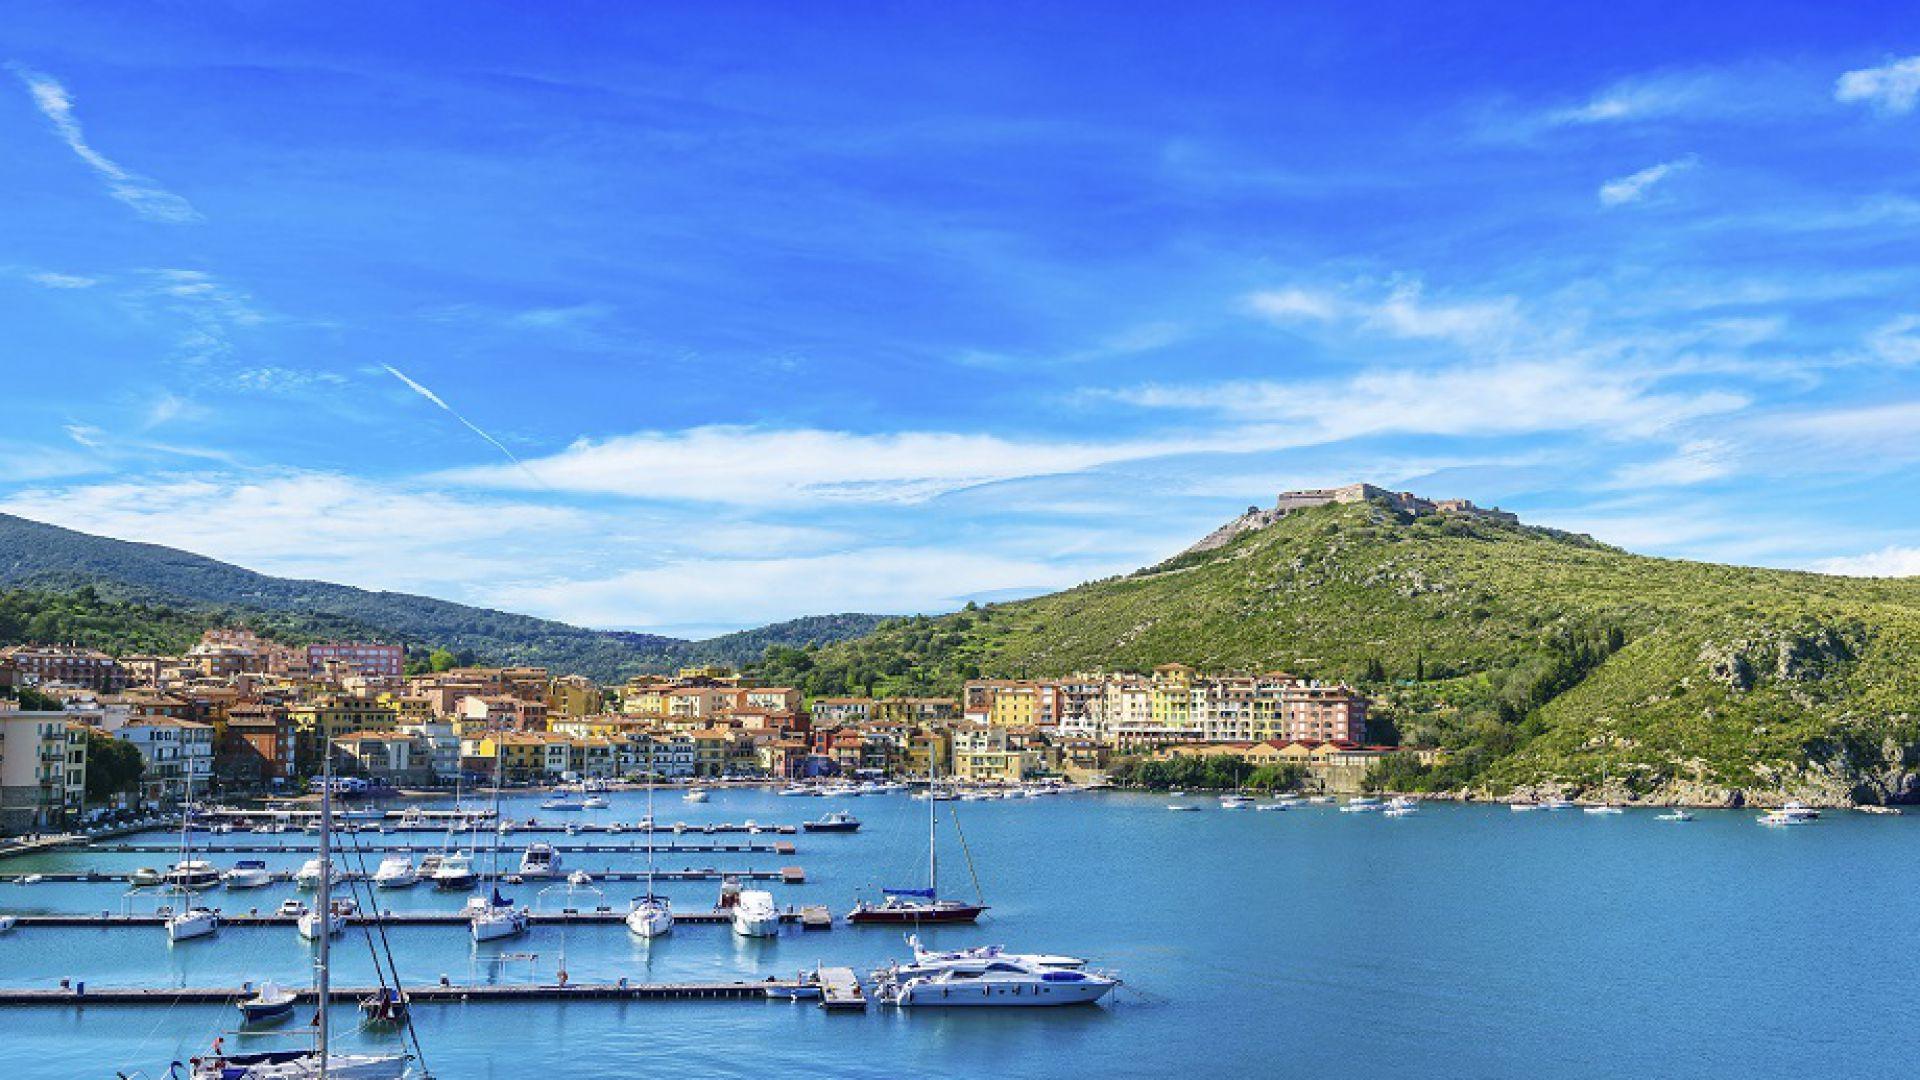 Toscana-porto.jpg